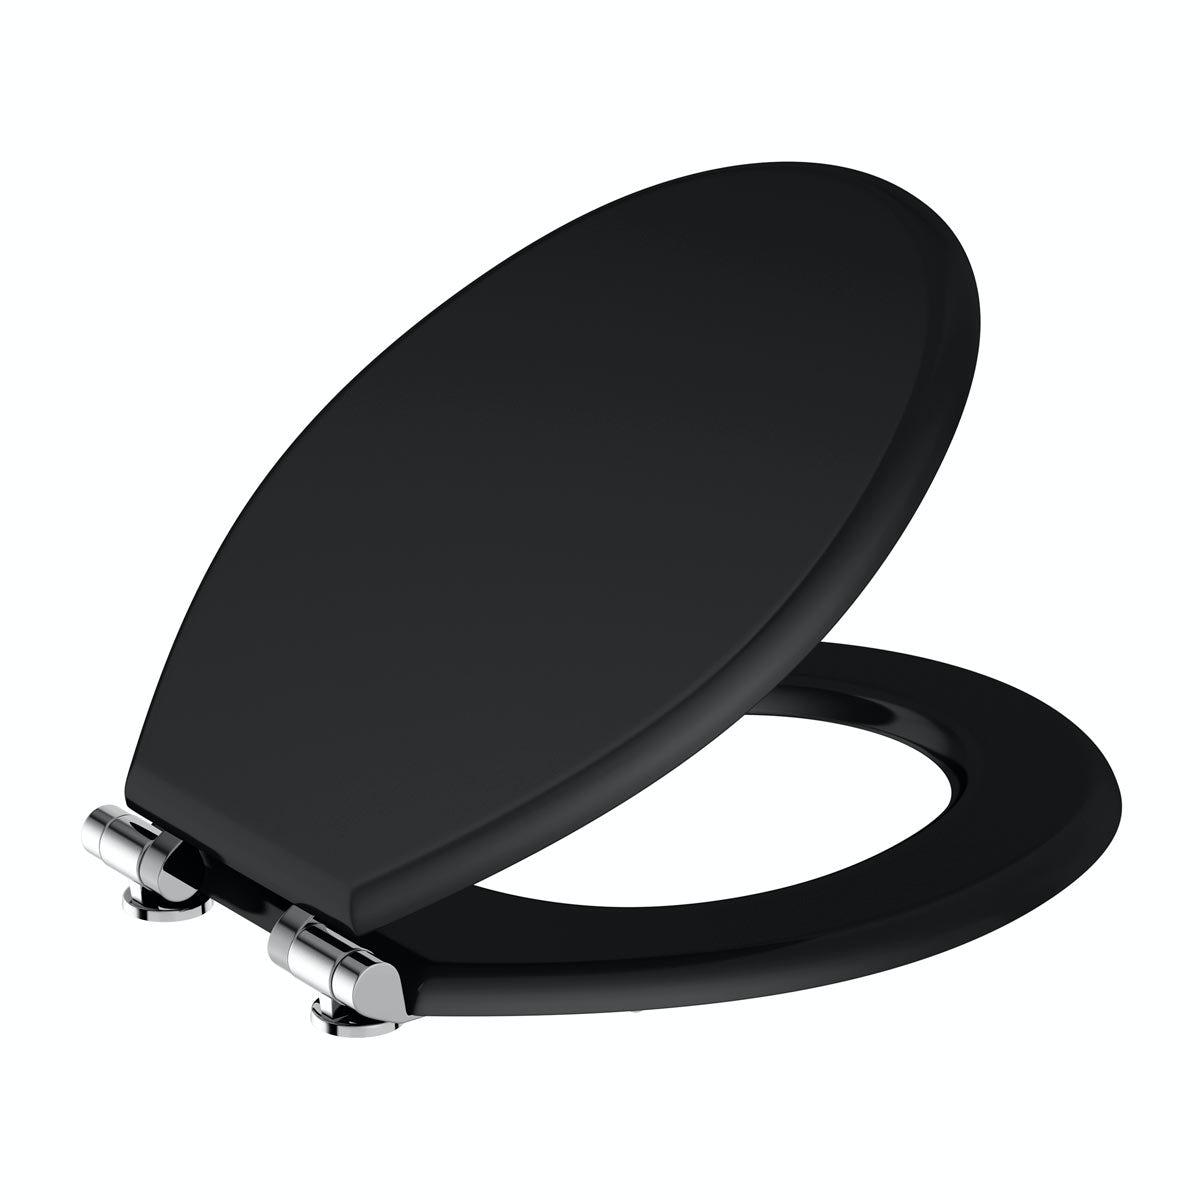 black wooden soft close toilet seat. Universal Matte Black Soft Close MDF Seat Toilet  VictoriaPlum com